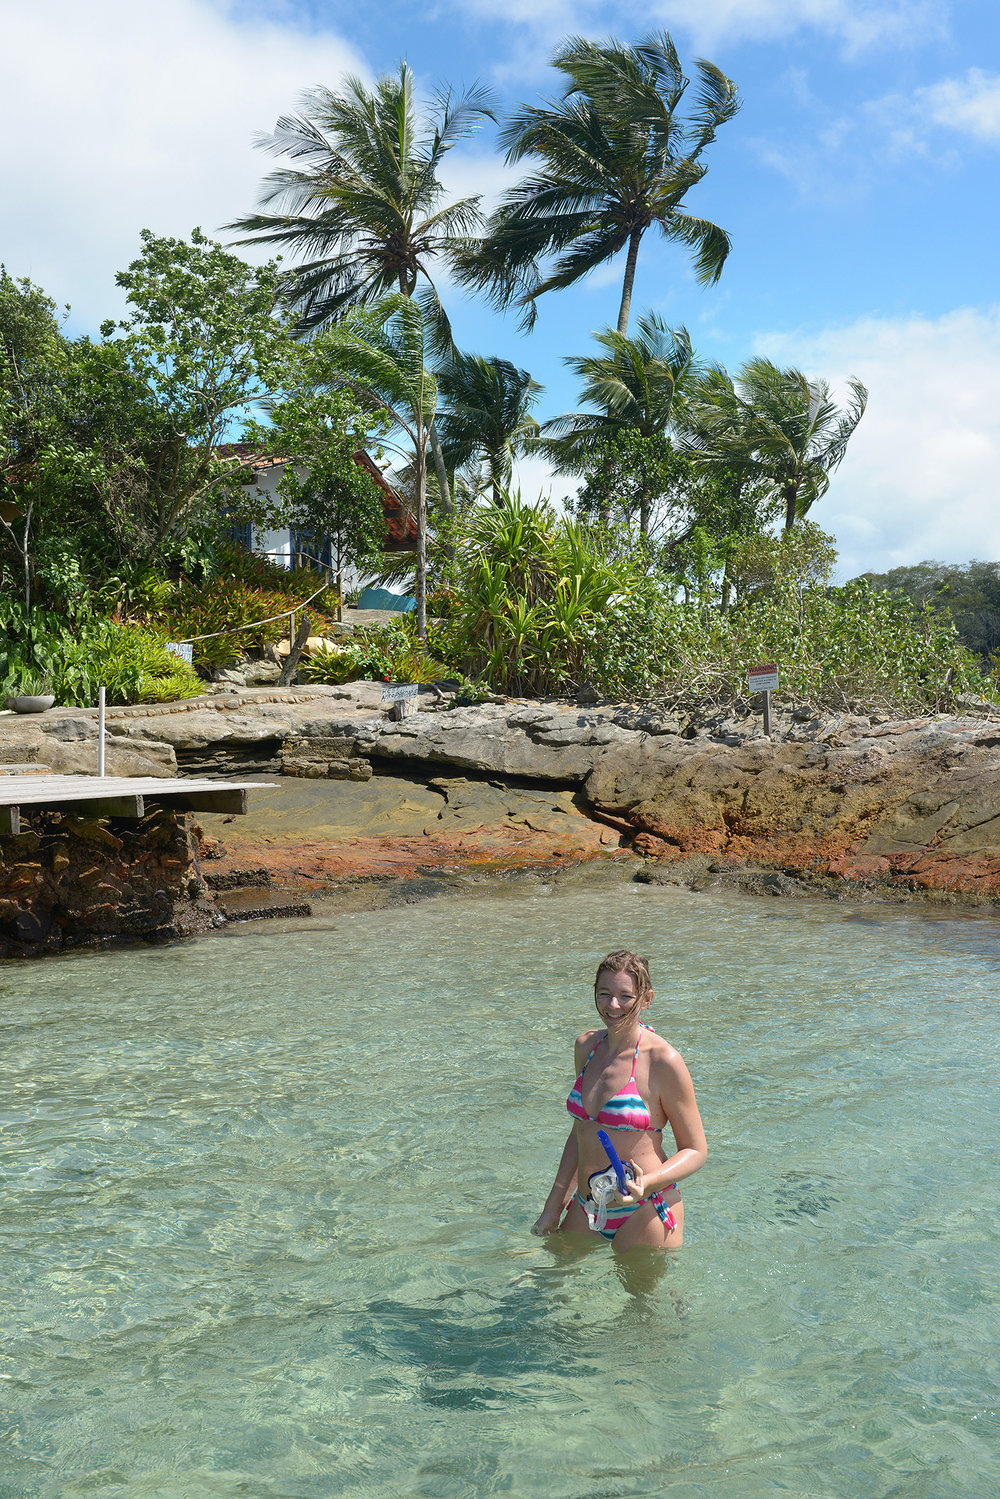 Matkablogi, matka, ranta, Brasilia, snorklata, turkoosi meri